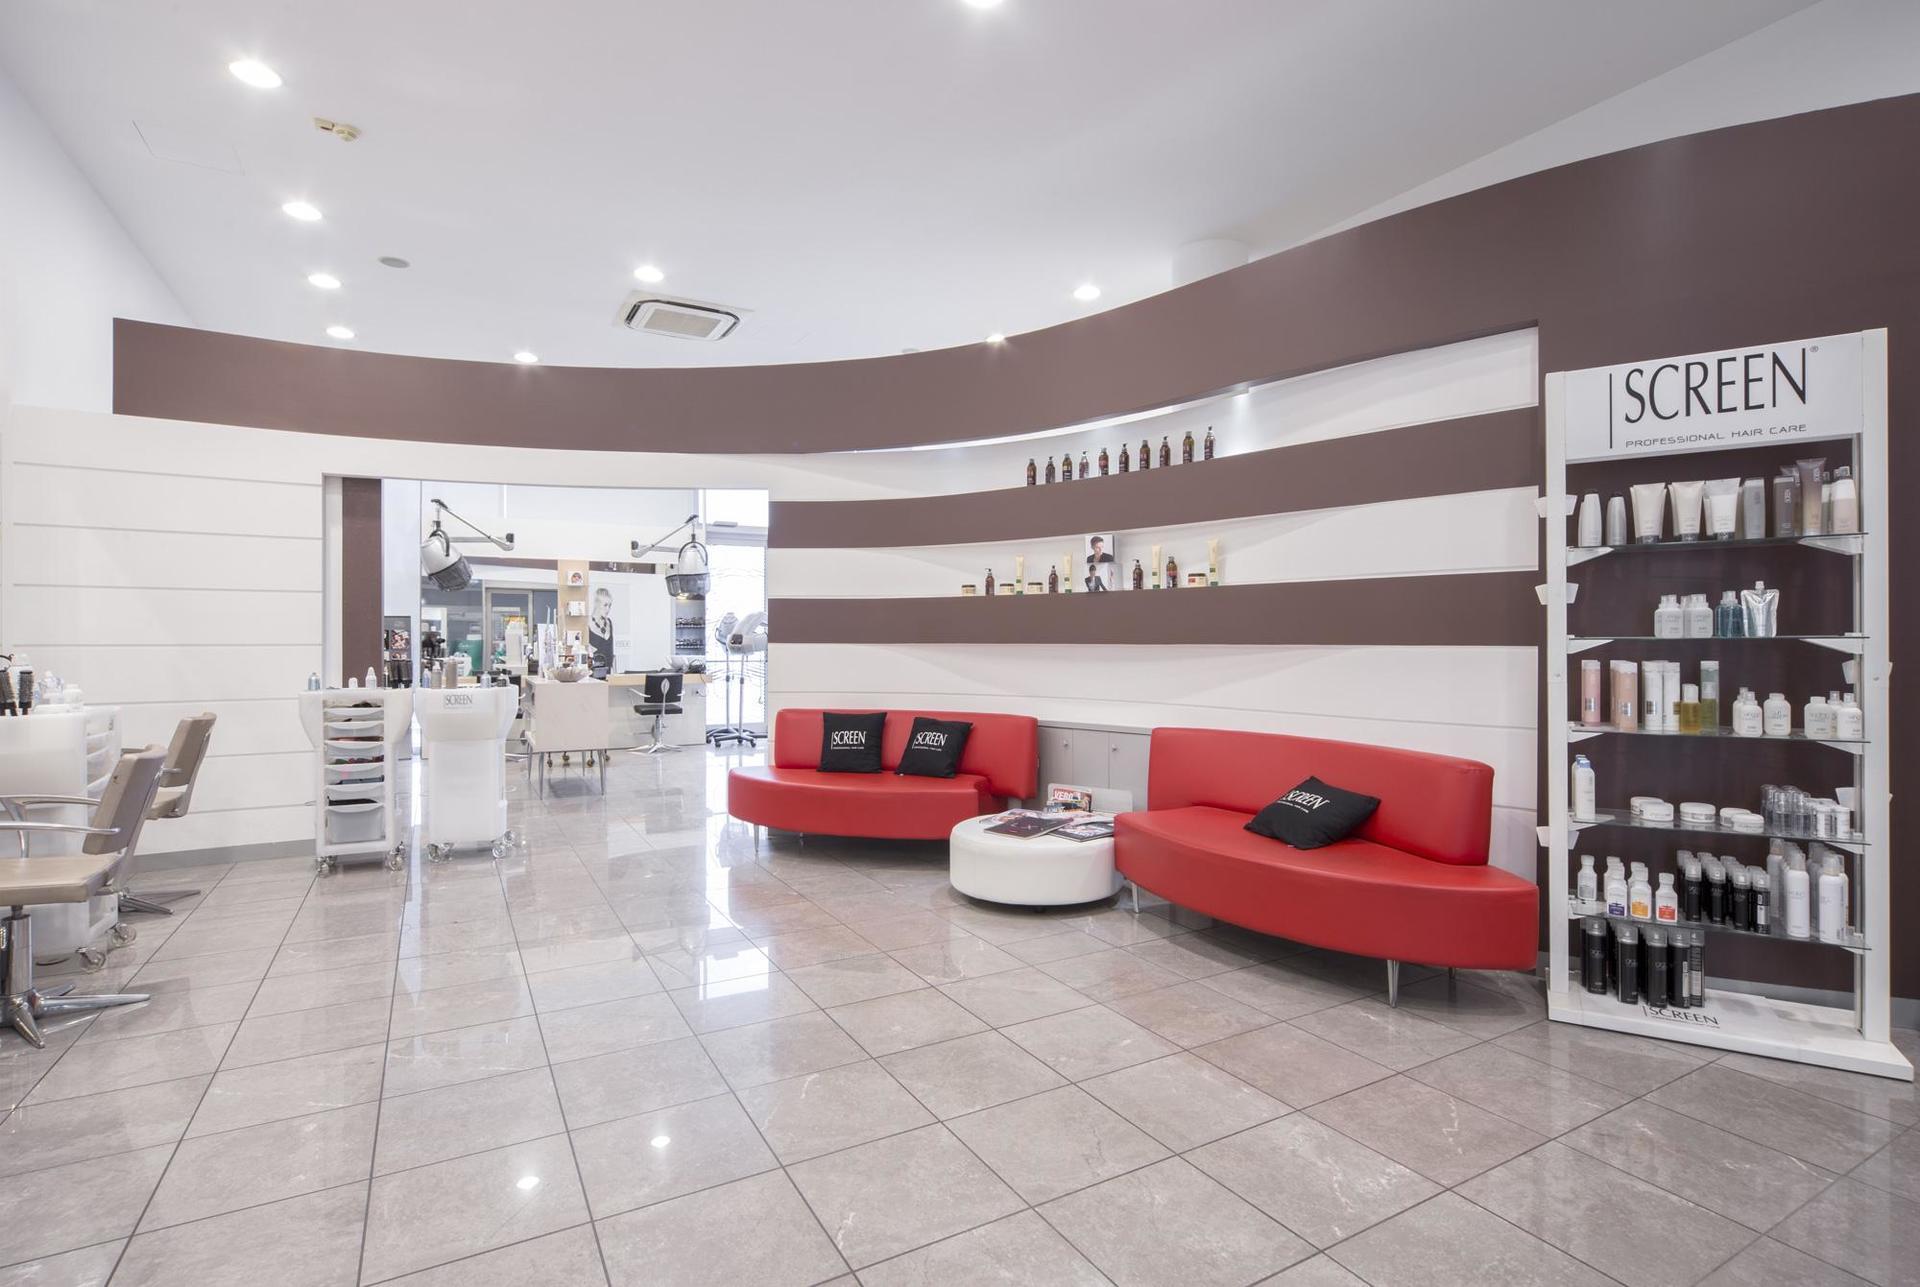 ingresso del salone di parrucchieri